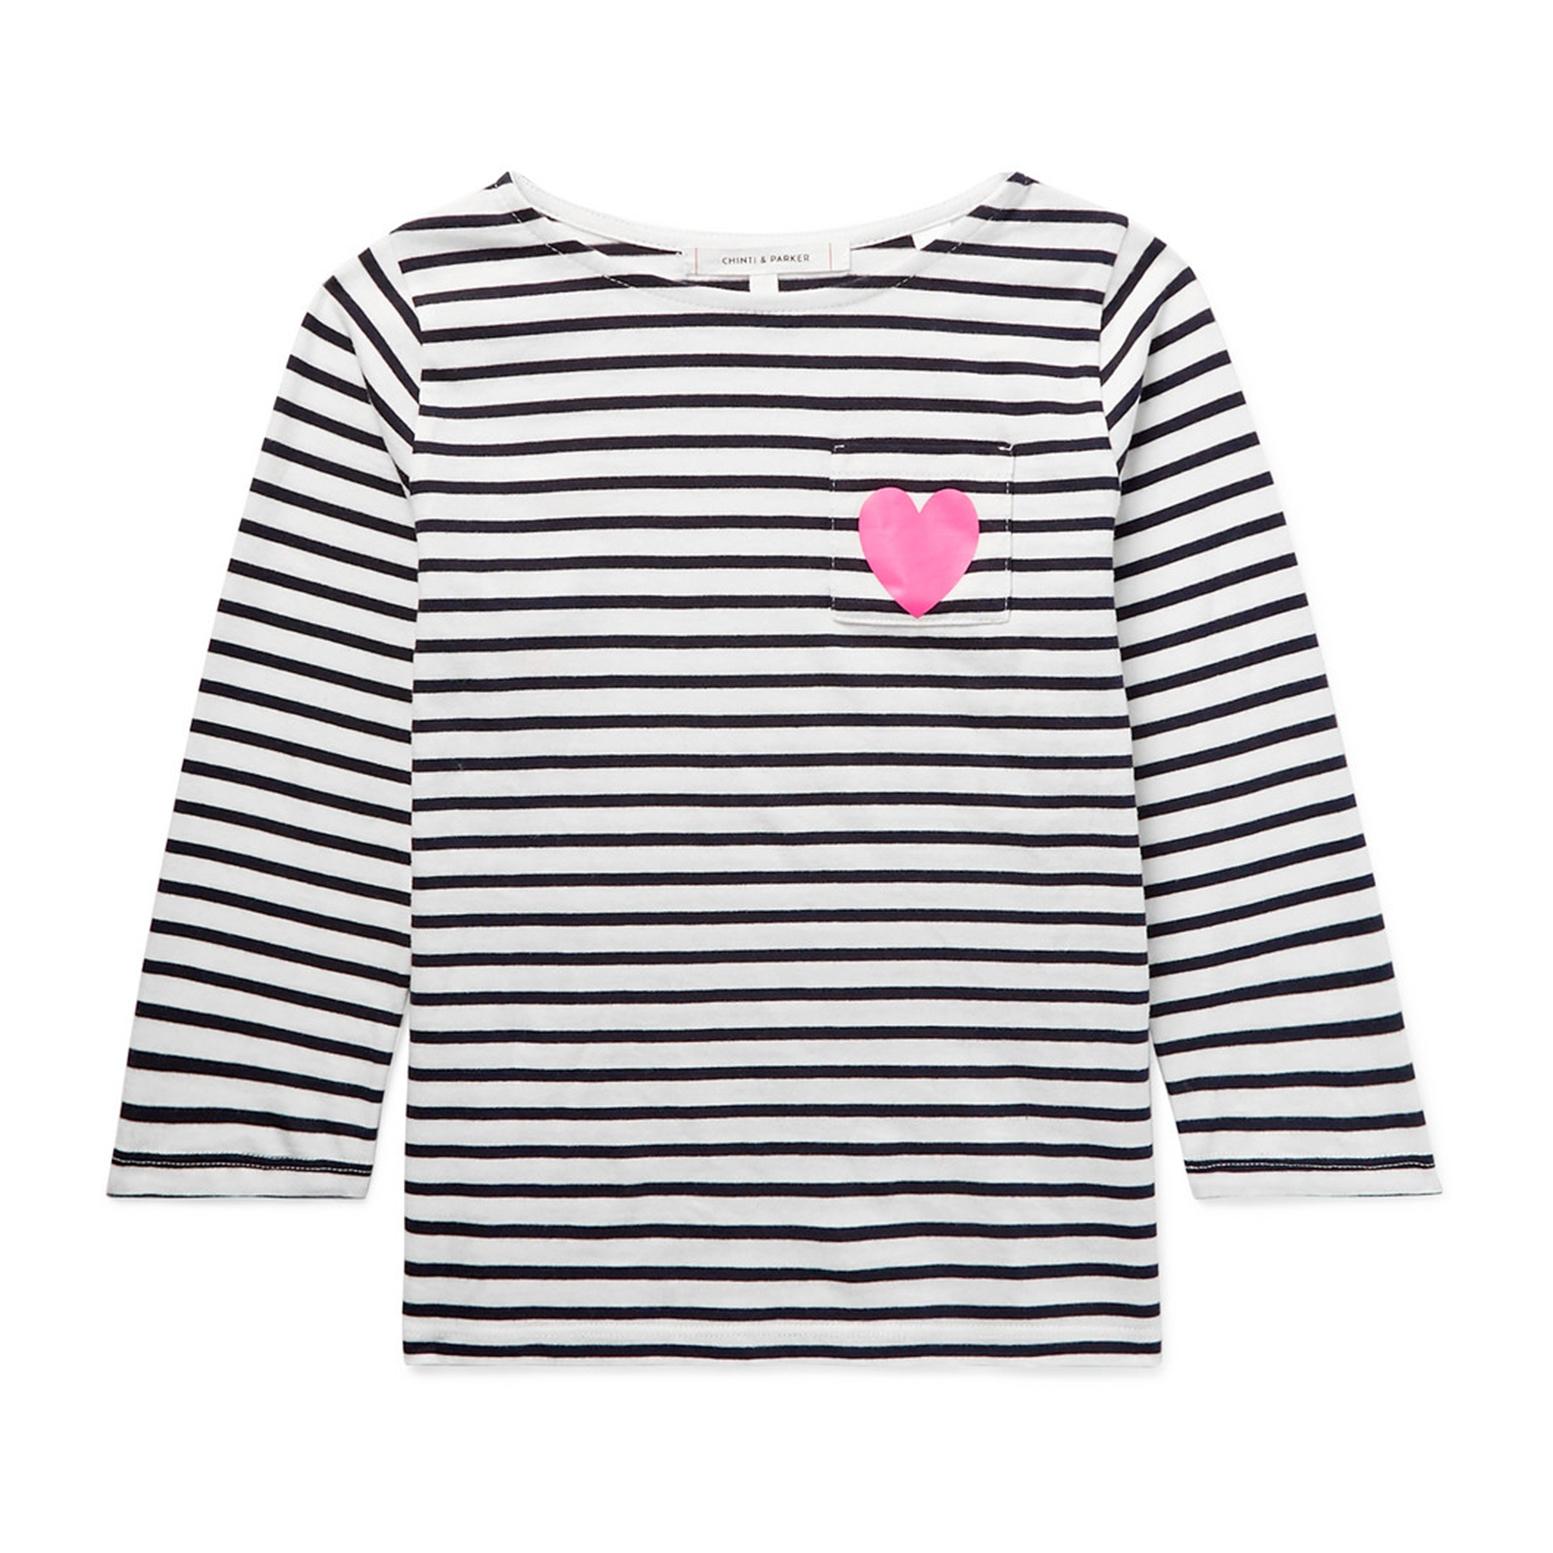 Chinti & Parker Kids Striped Cotton-Jersey Top